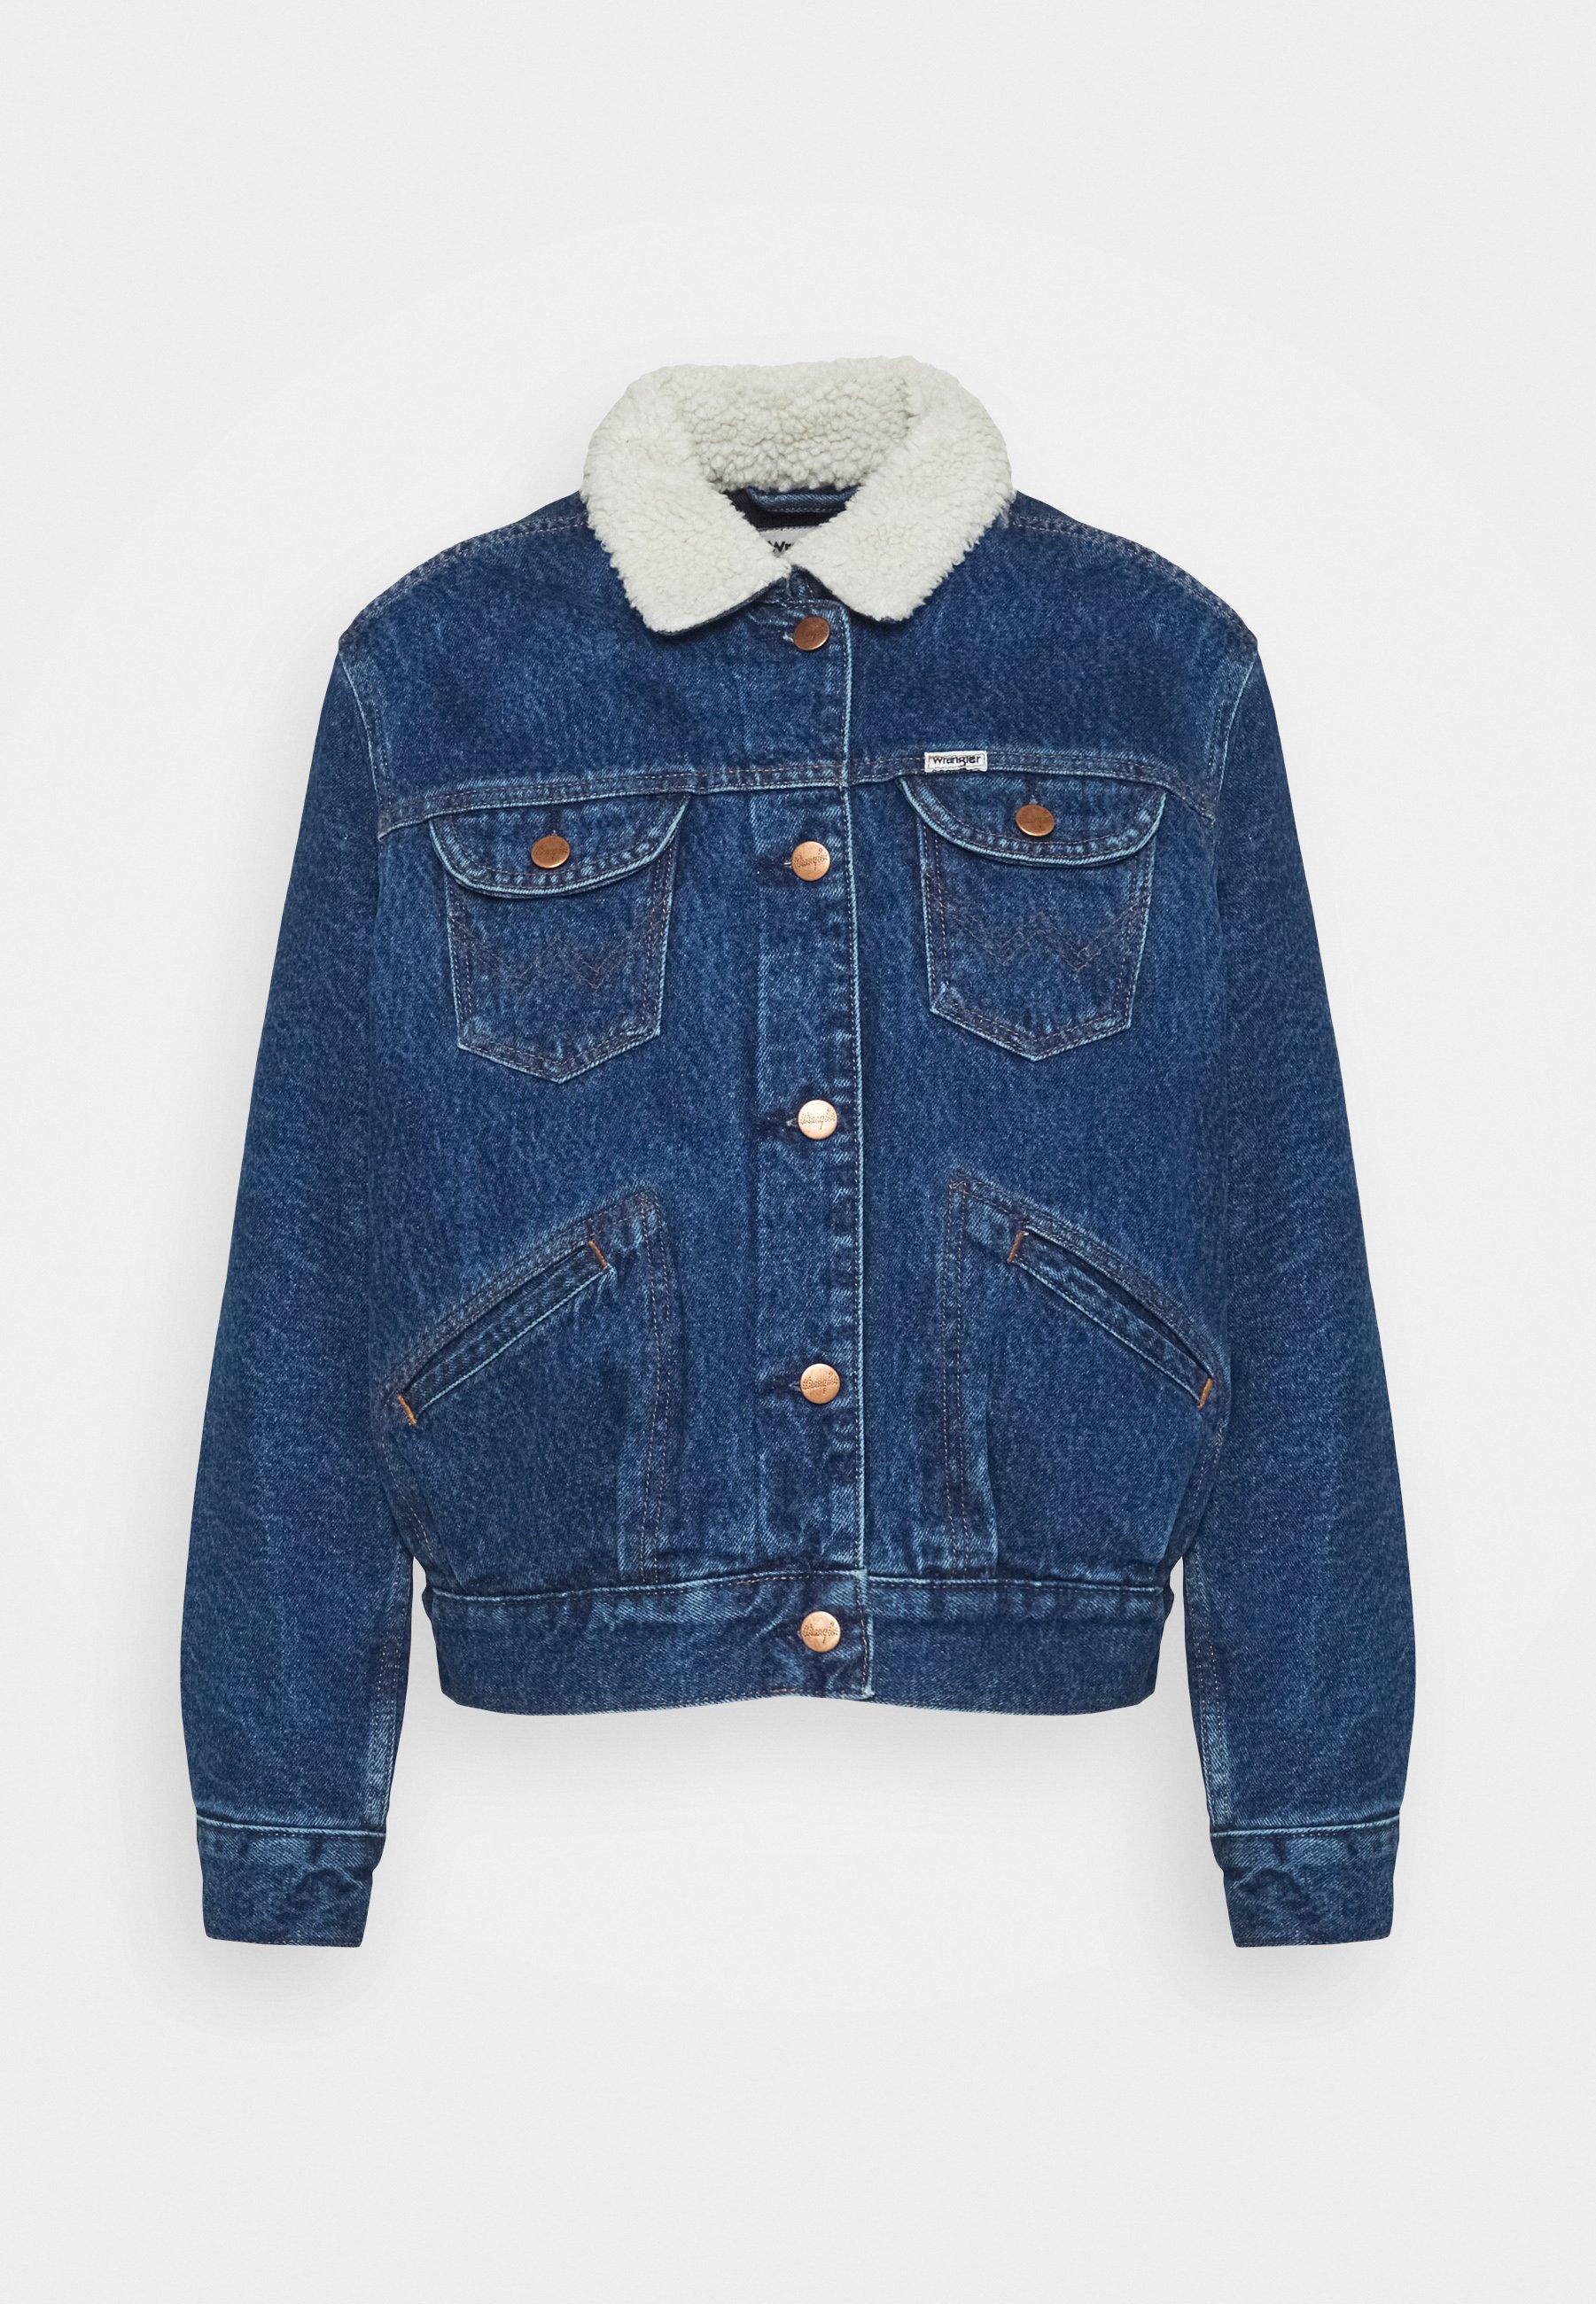 Wrangler Jeansjackor | Herr | Köp jeansjacka online på